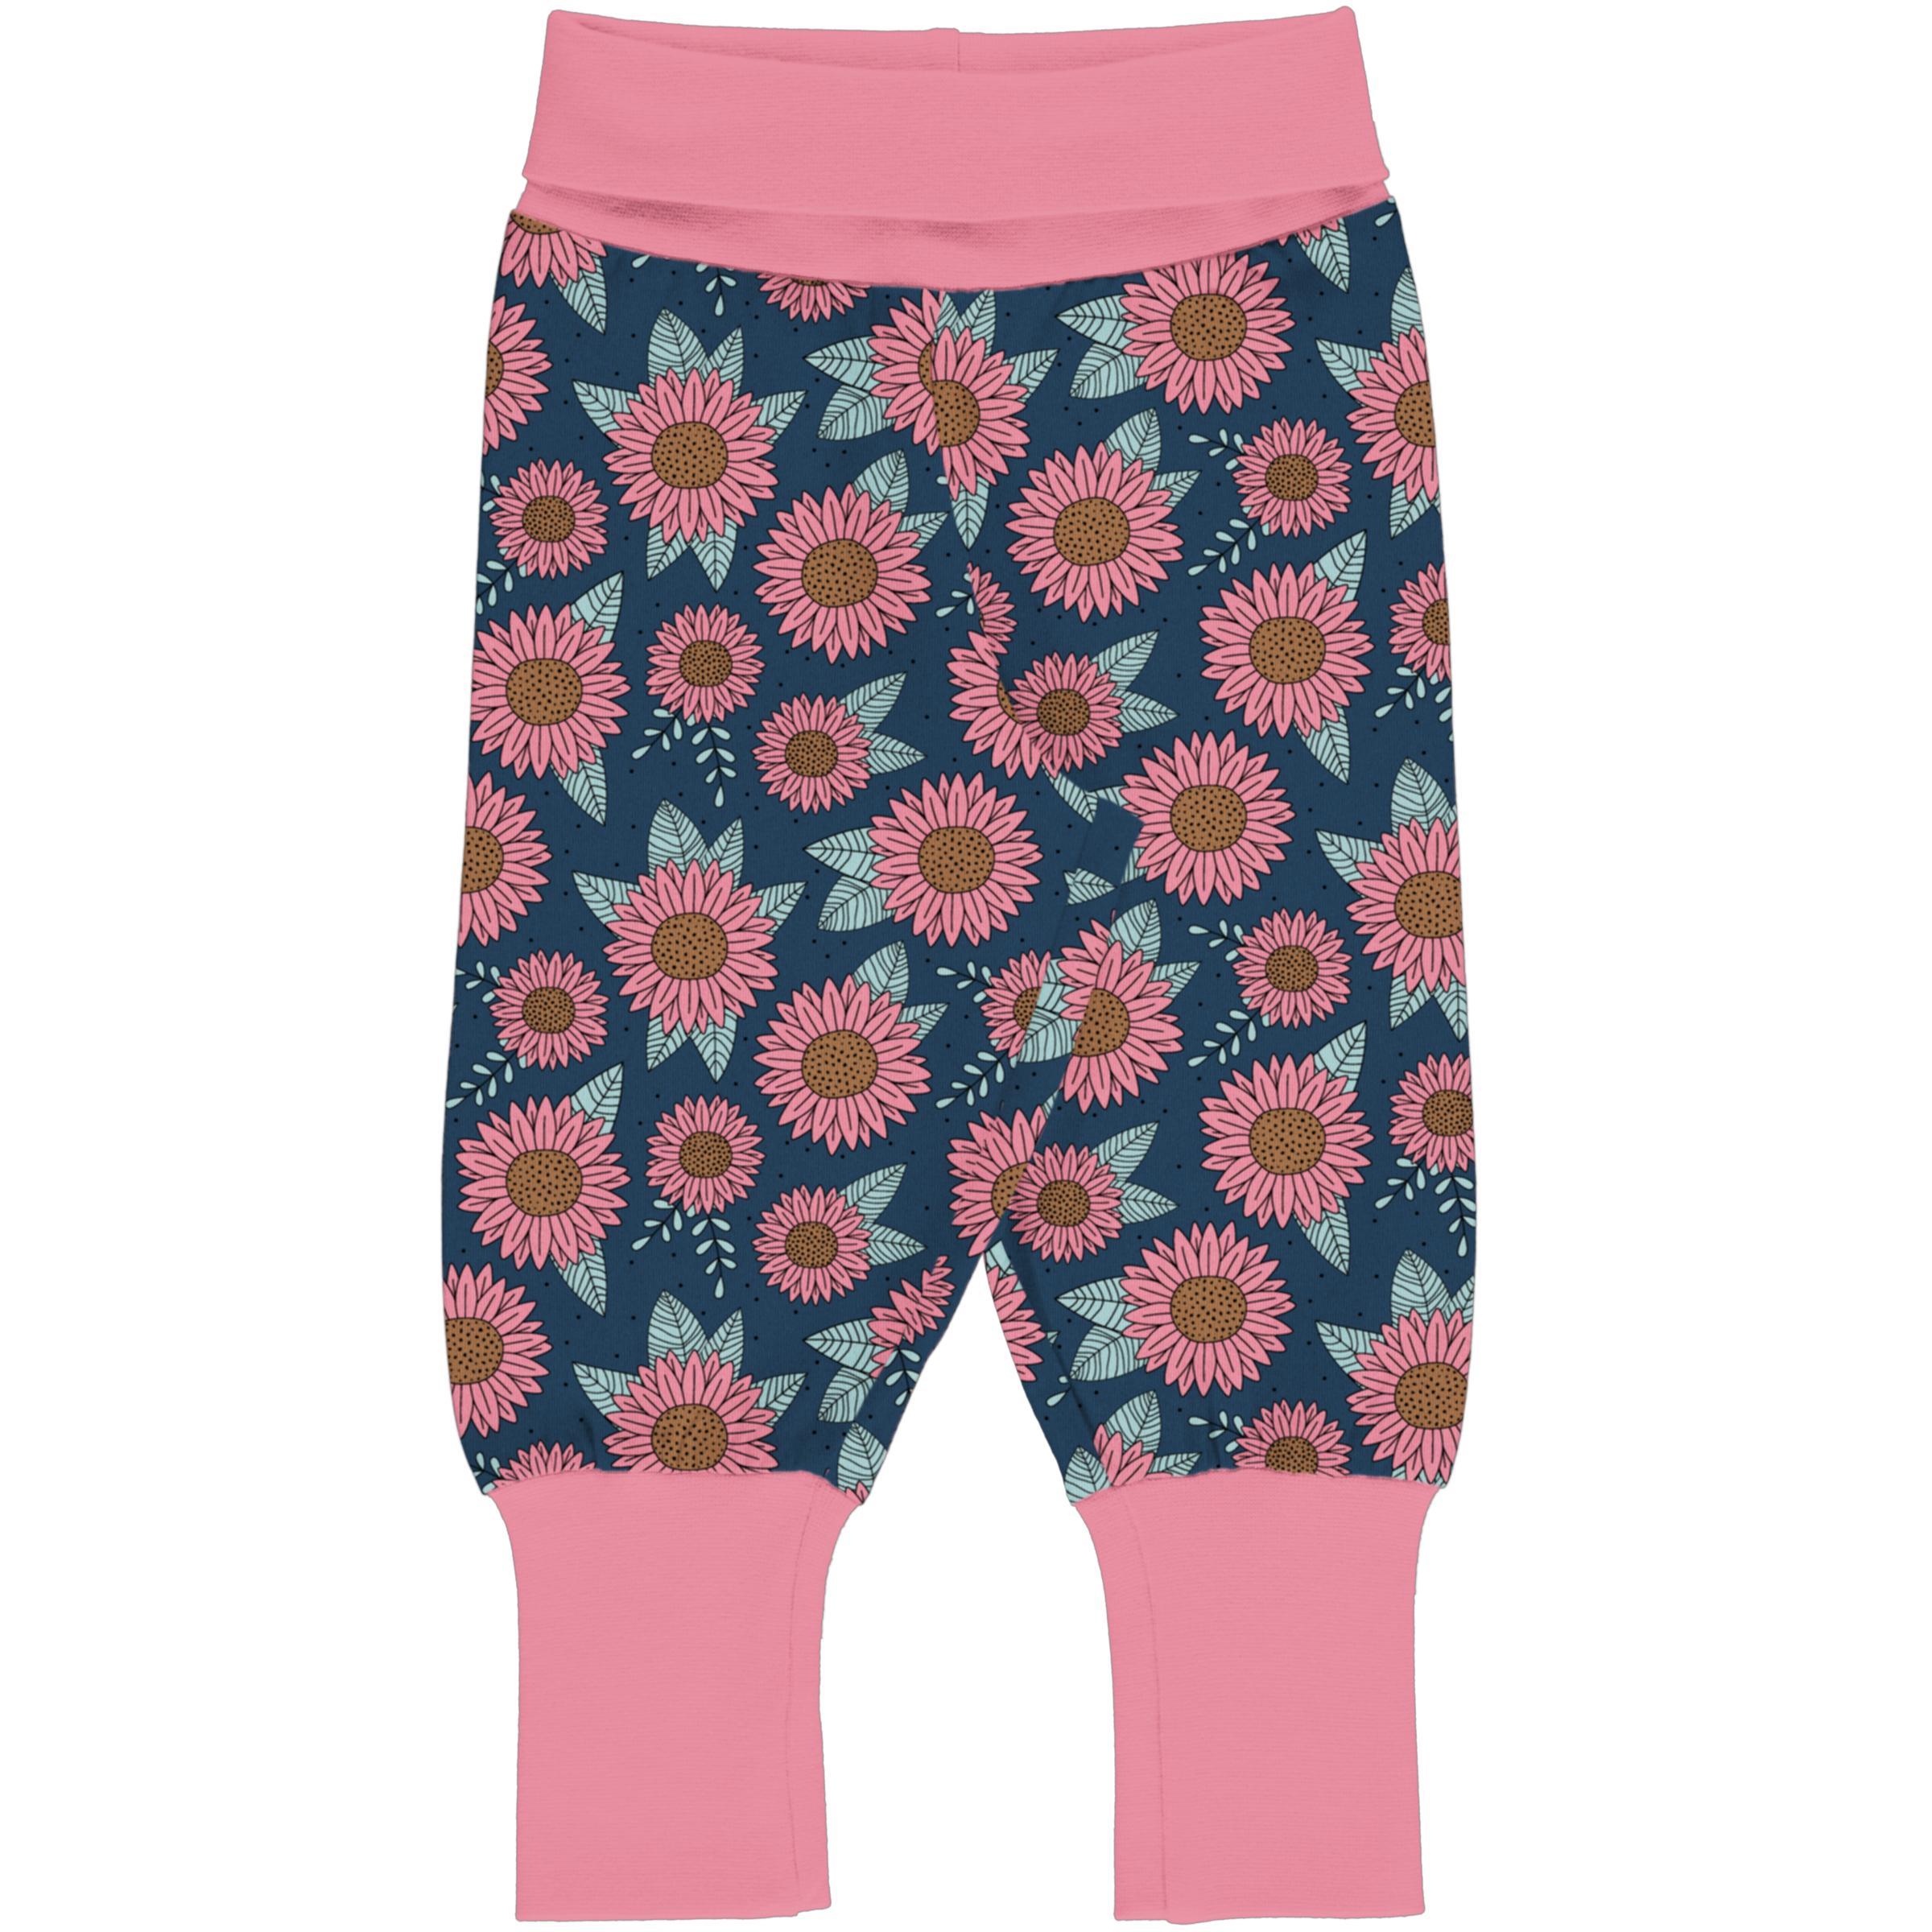 Meyadey by Maxomorra Baby Rib Pants SUNFLOWER DREAMS 086/092